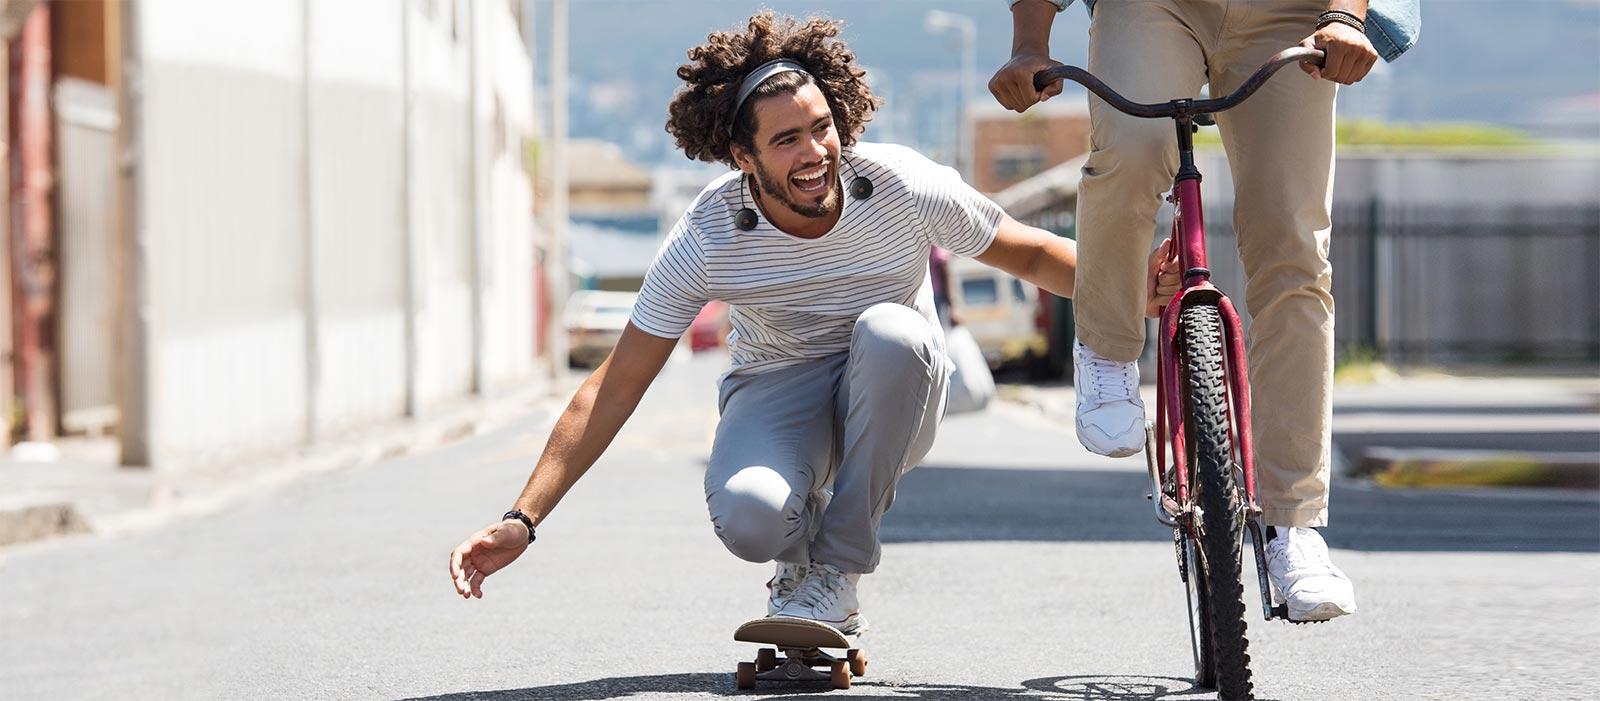 urban skater bluetooth portable speakers